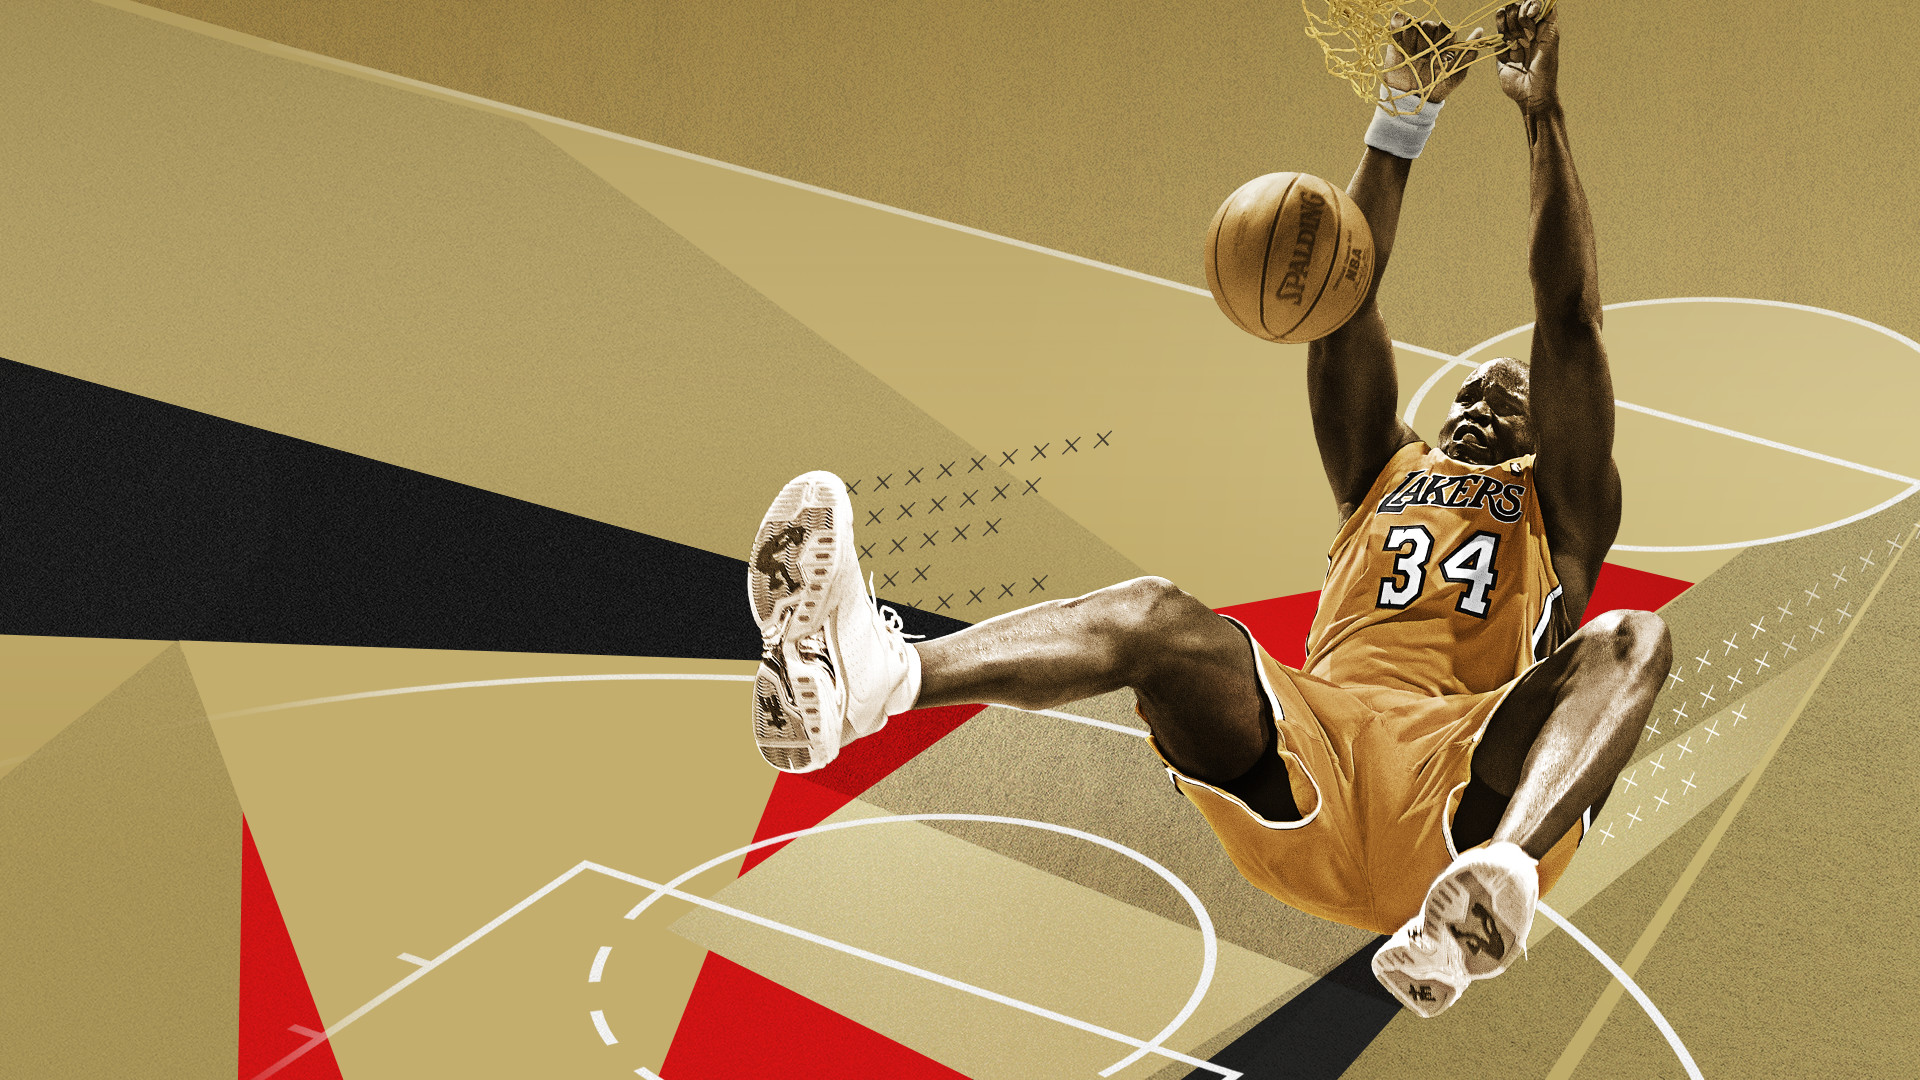 NBA 2K18 image 1